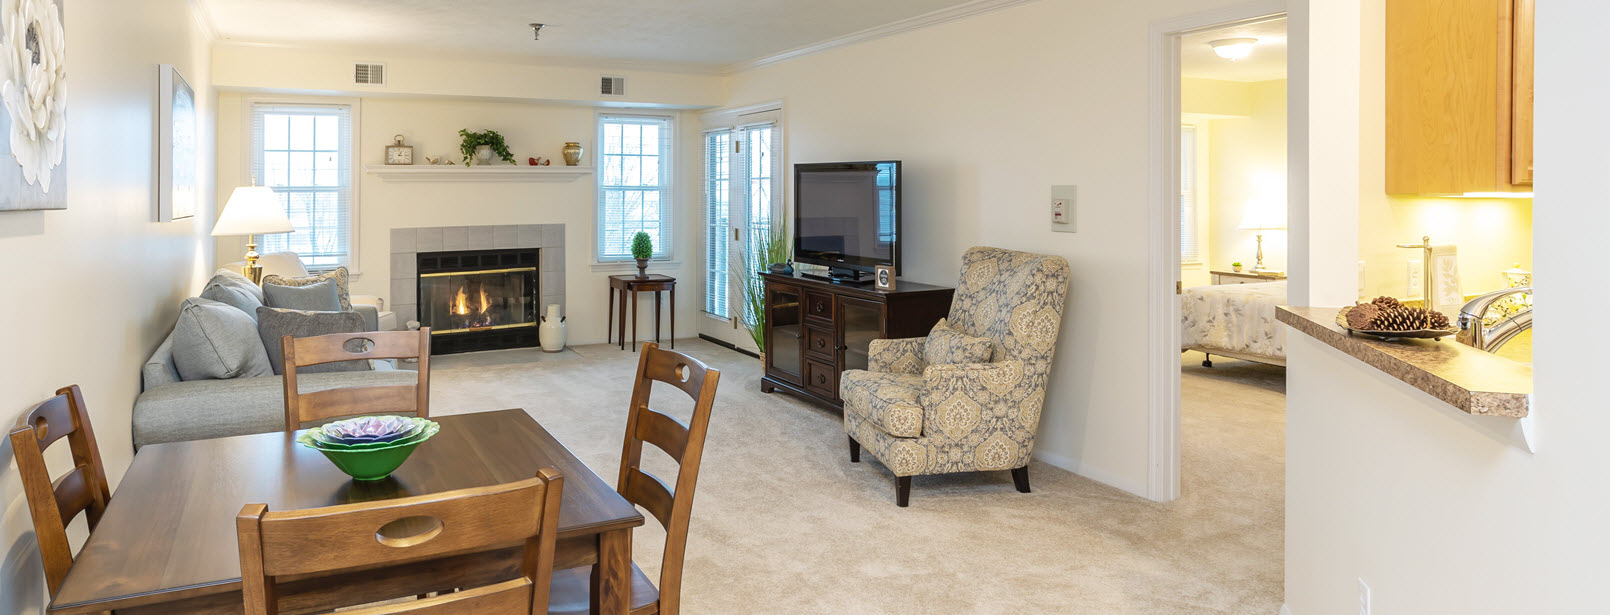 interior of a senior living apartment at Asbury senior living